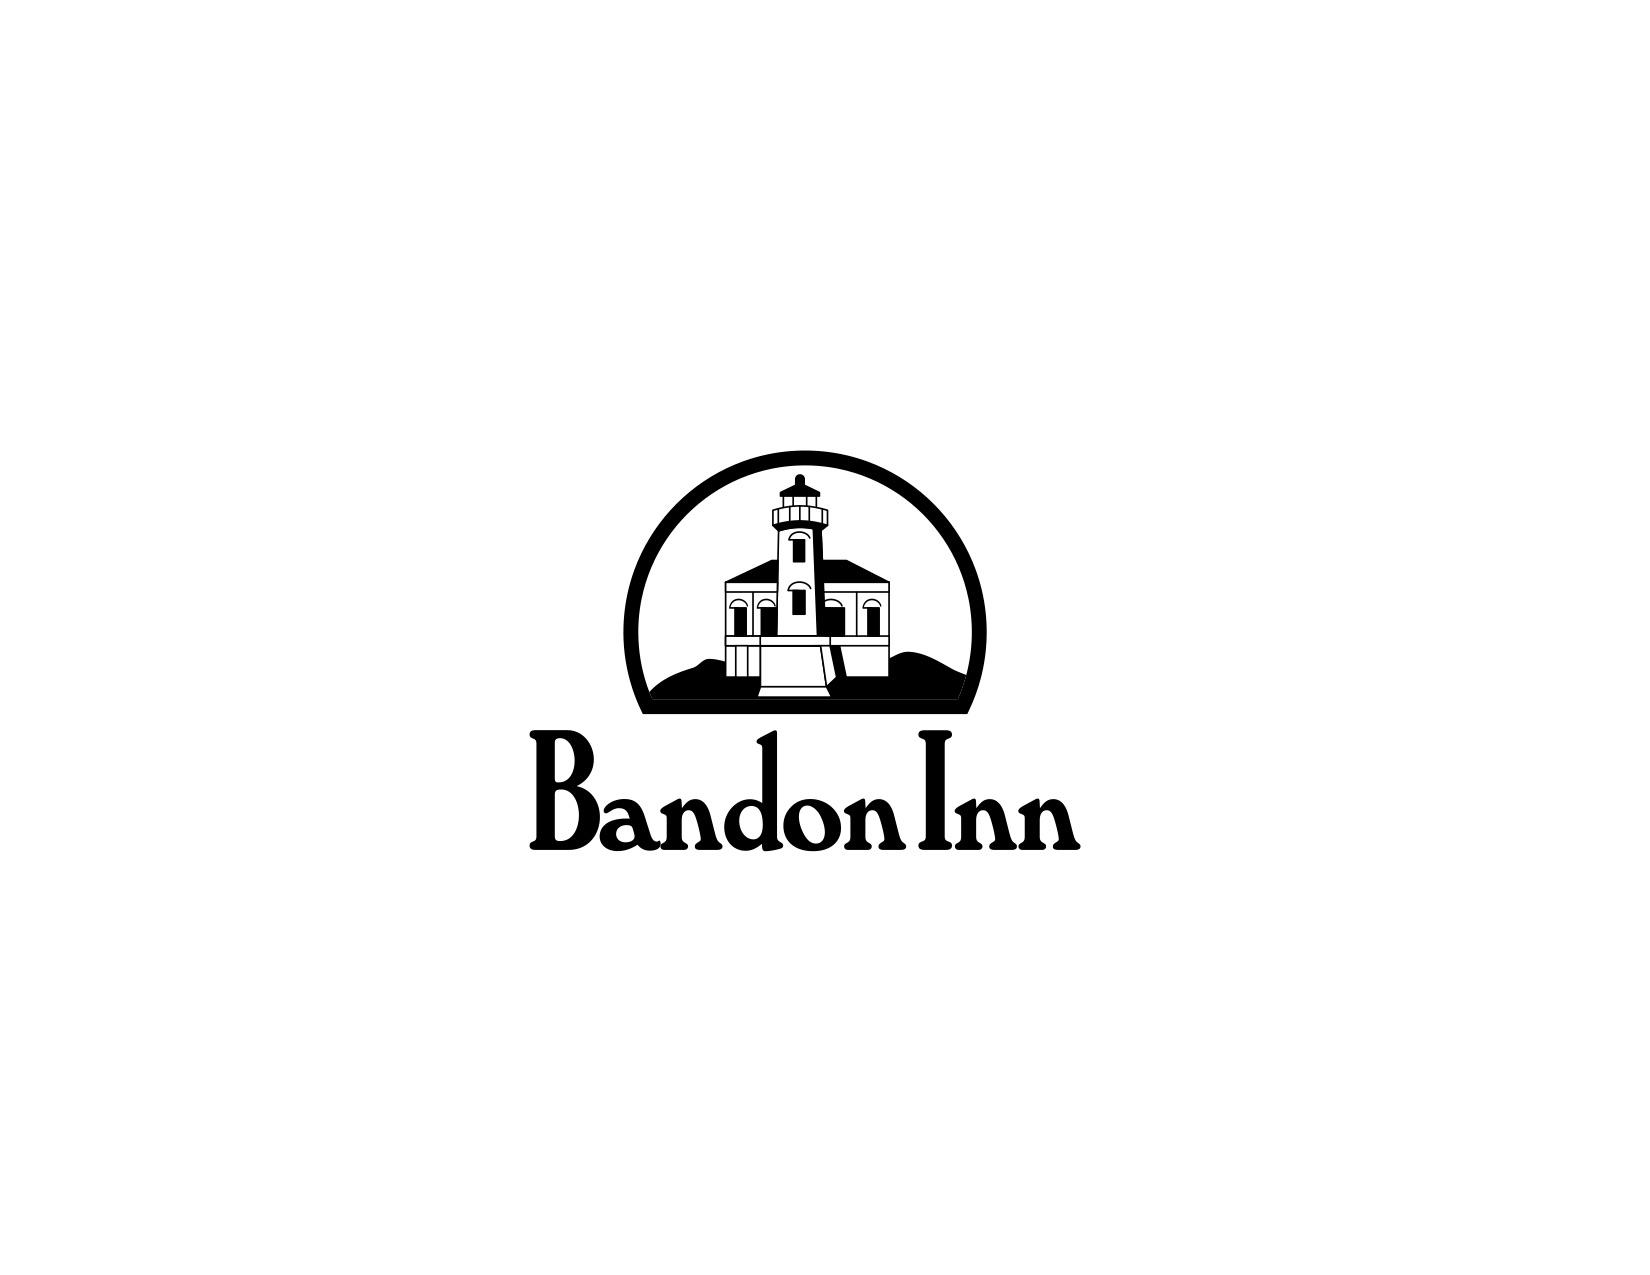 Bandon Inn LOGO jpg.jpg